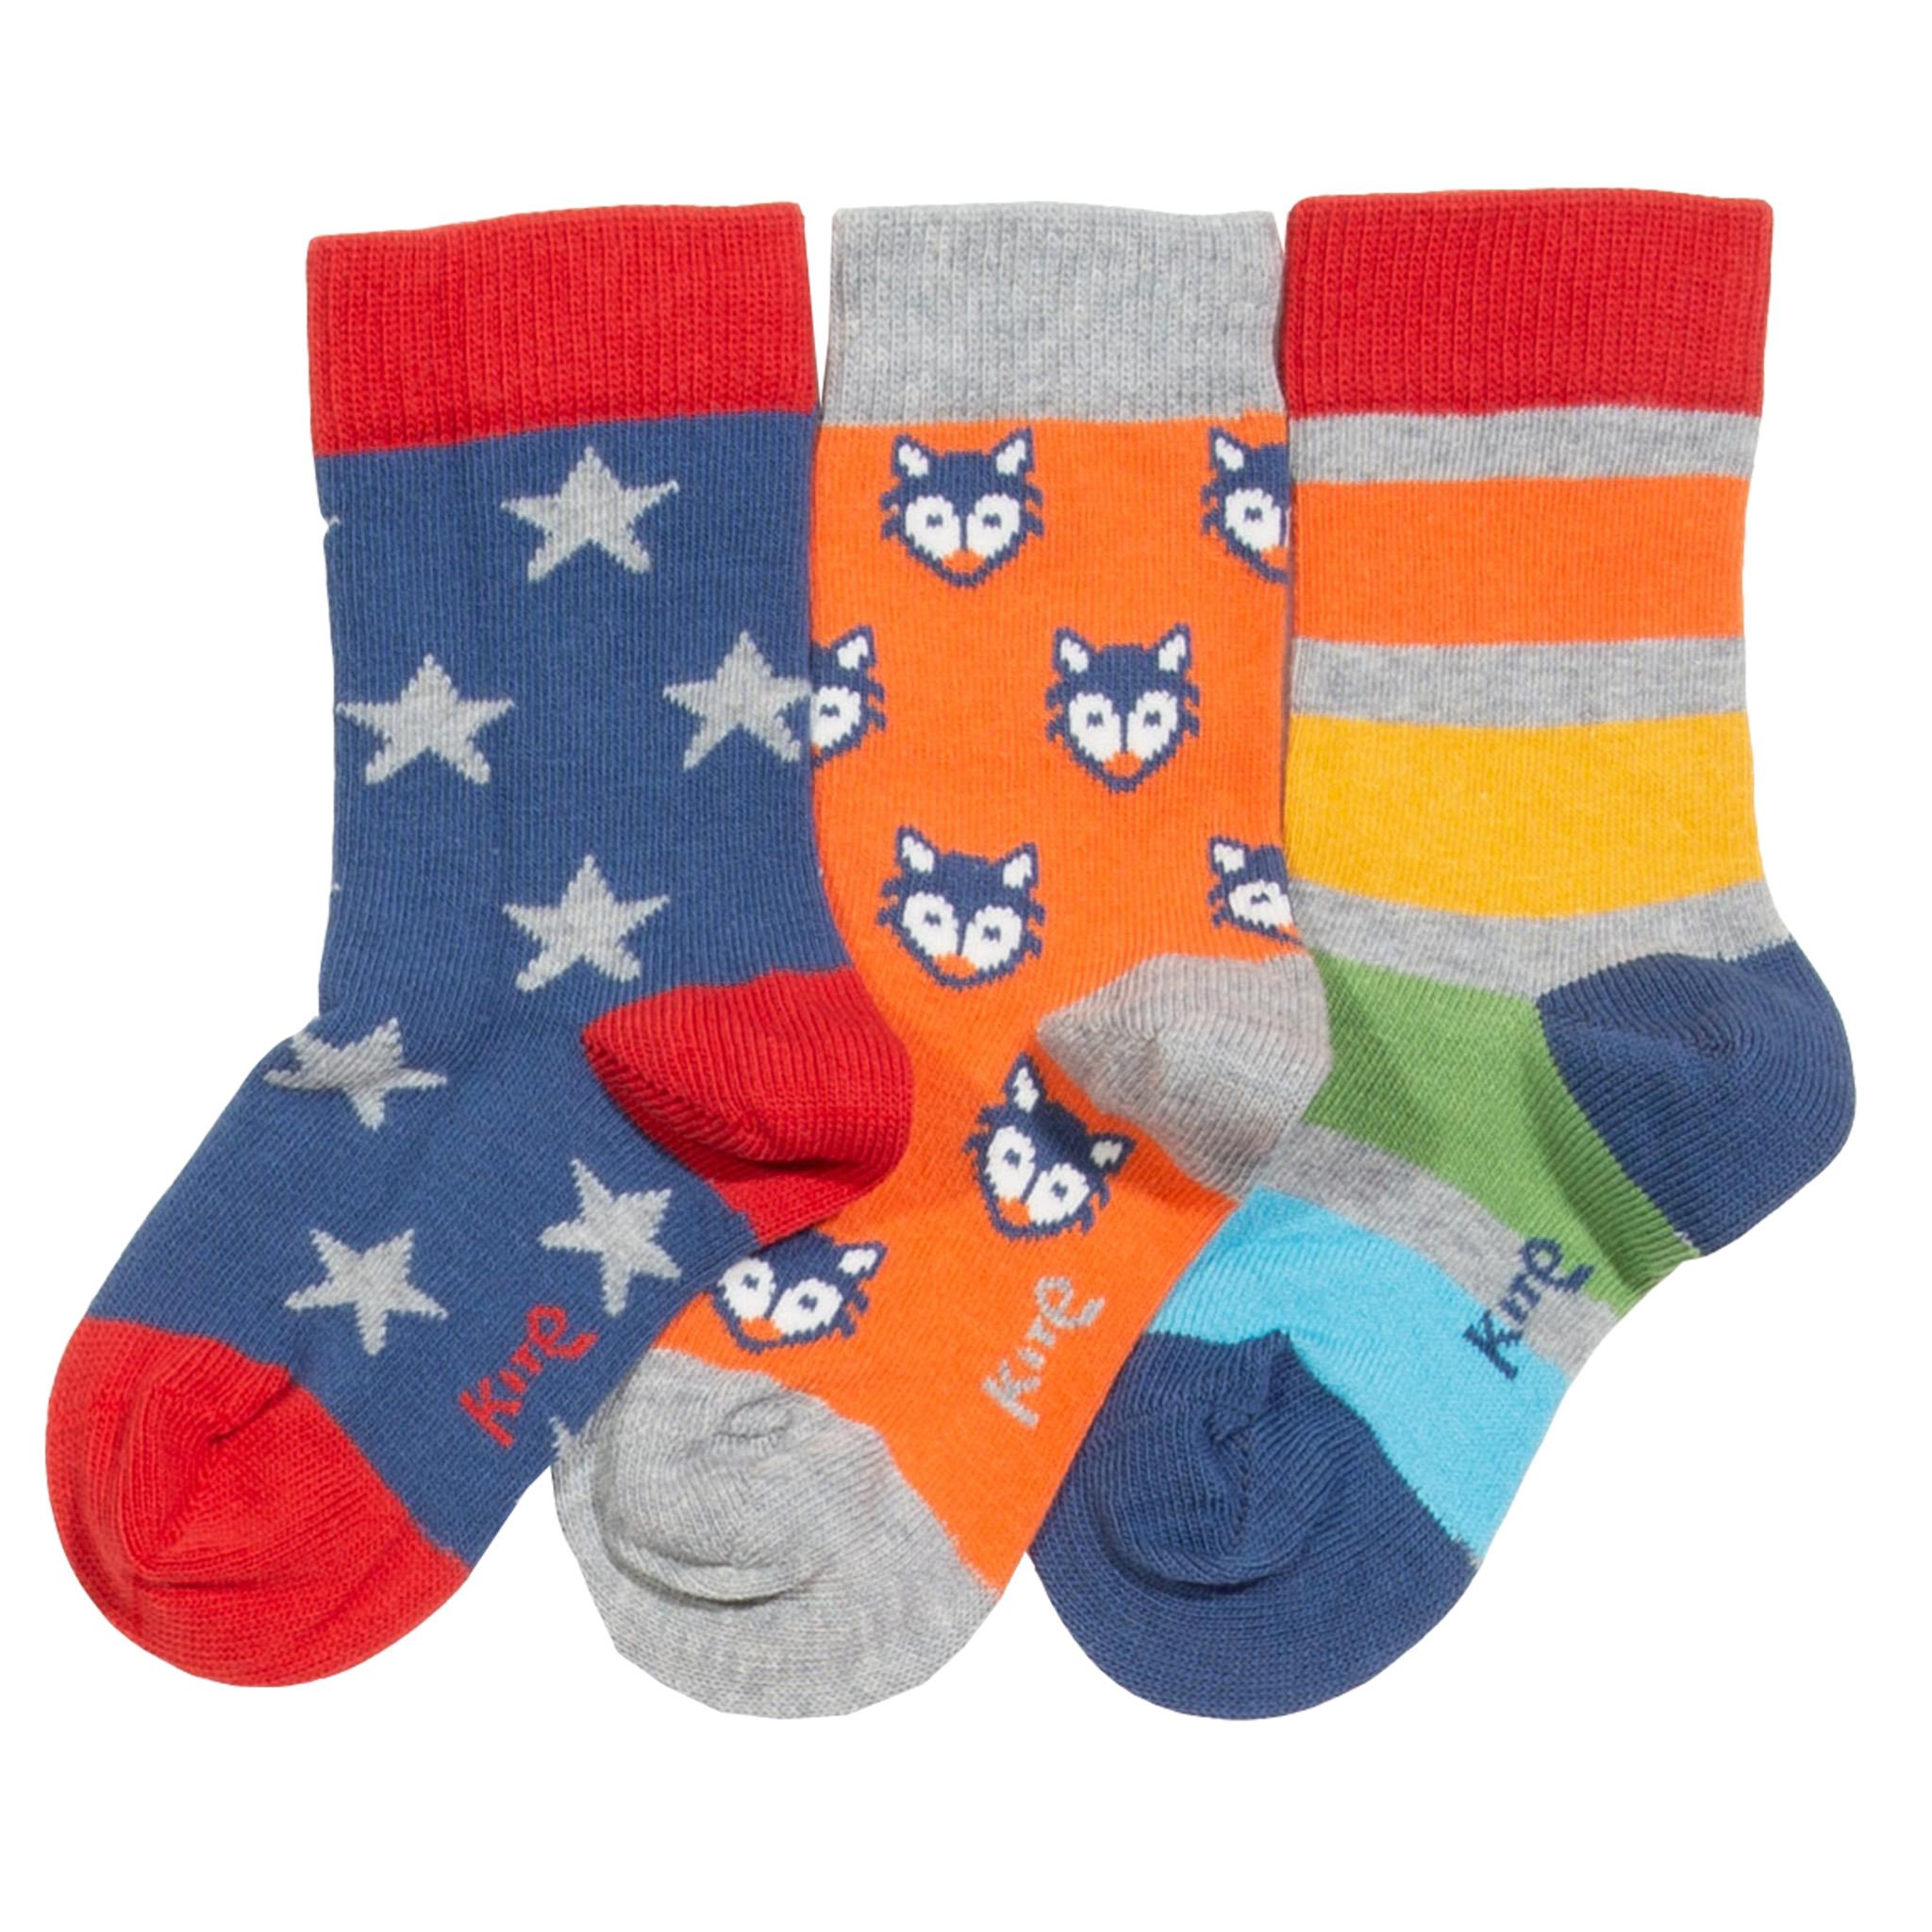 Kite Little Cub Socks